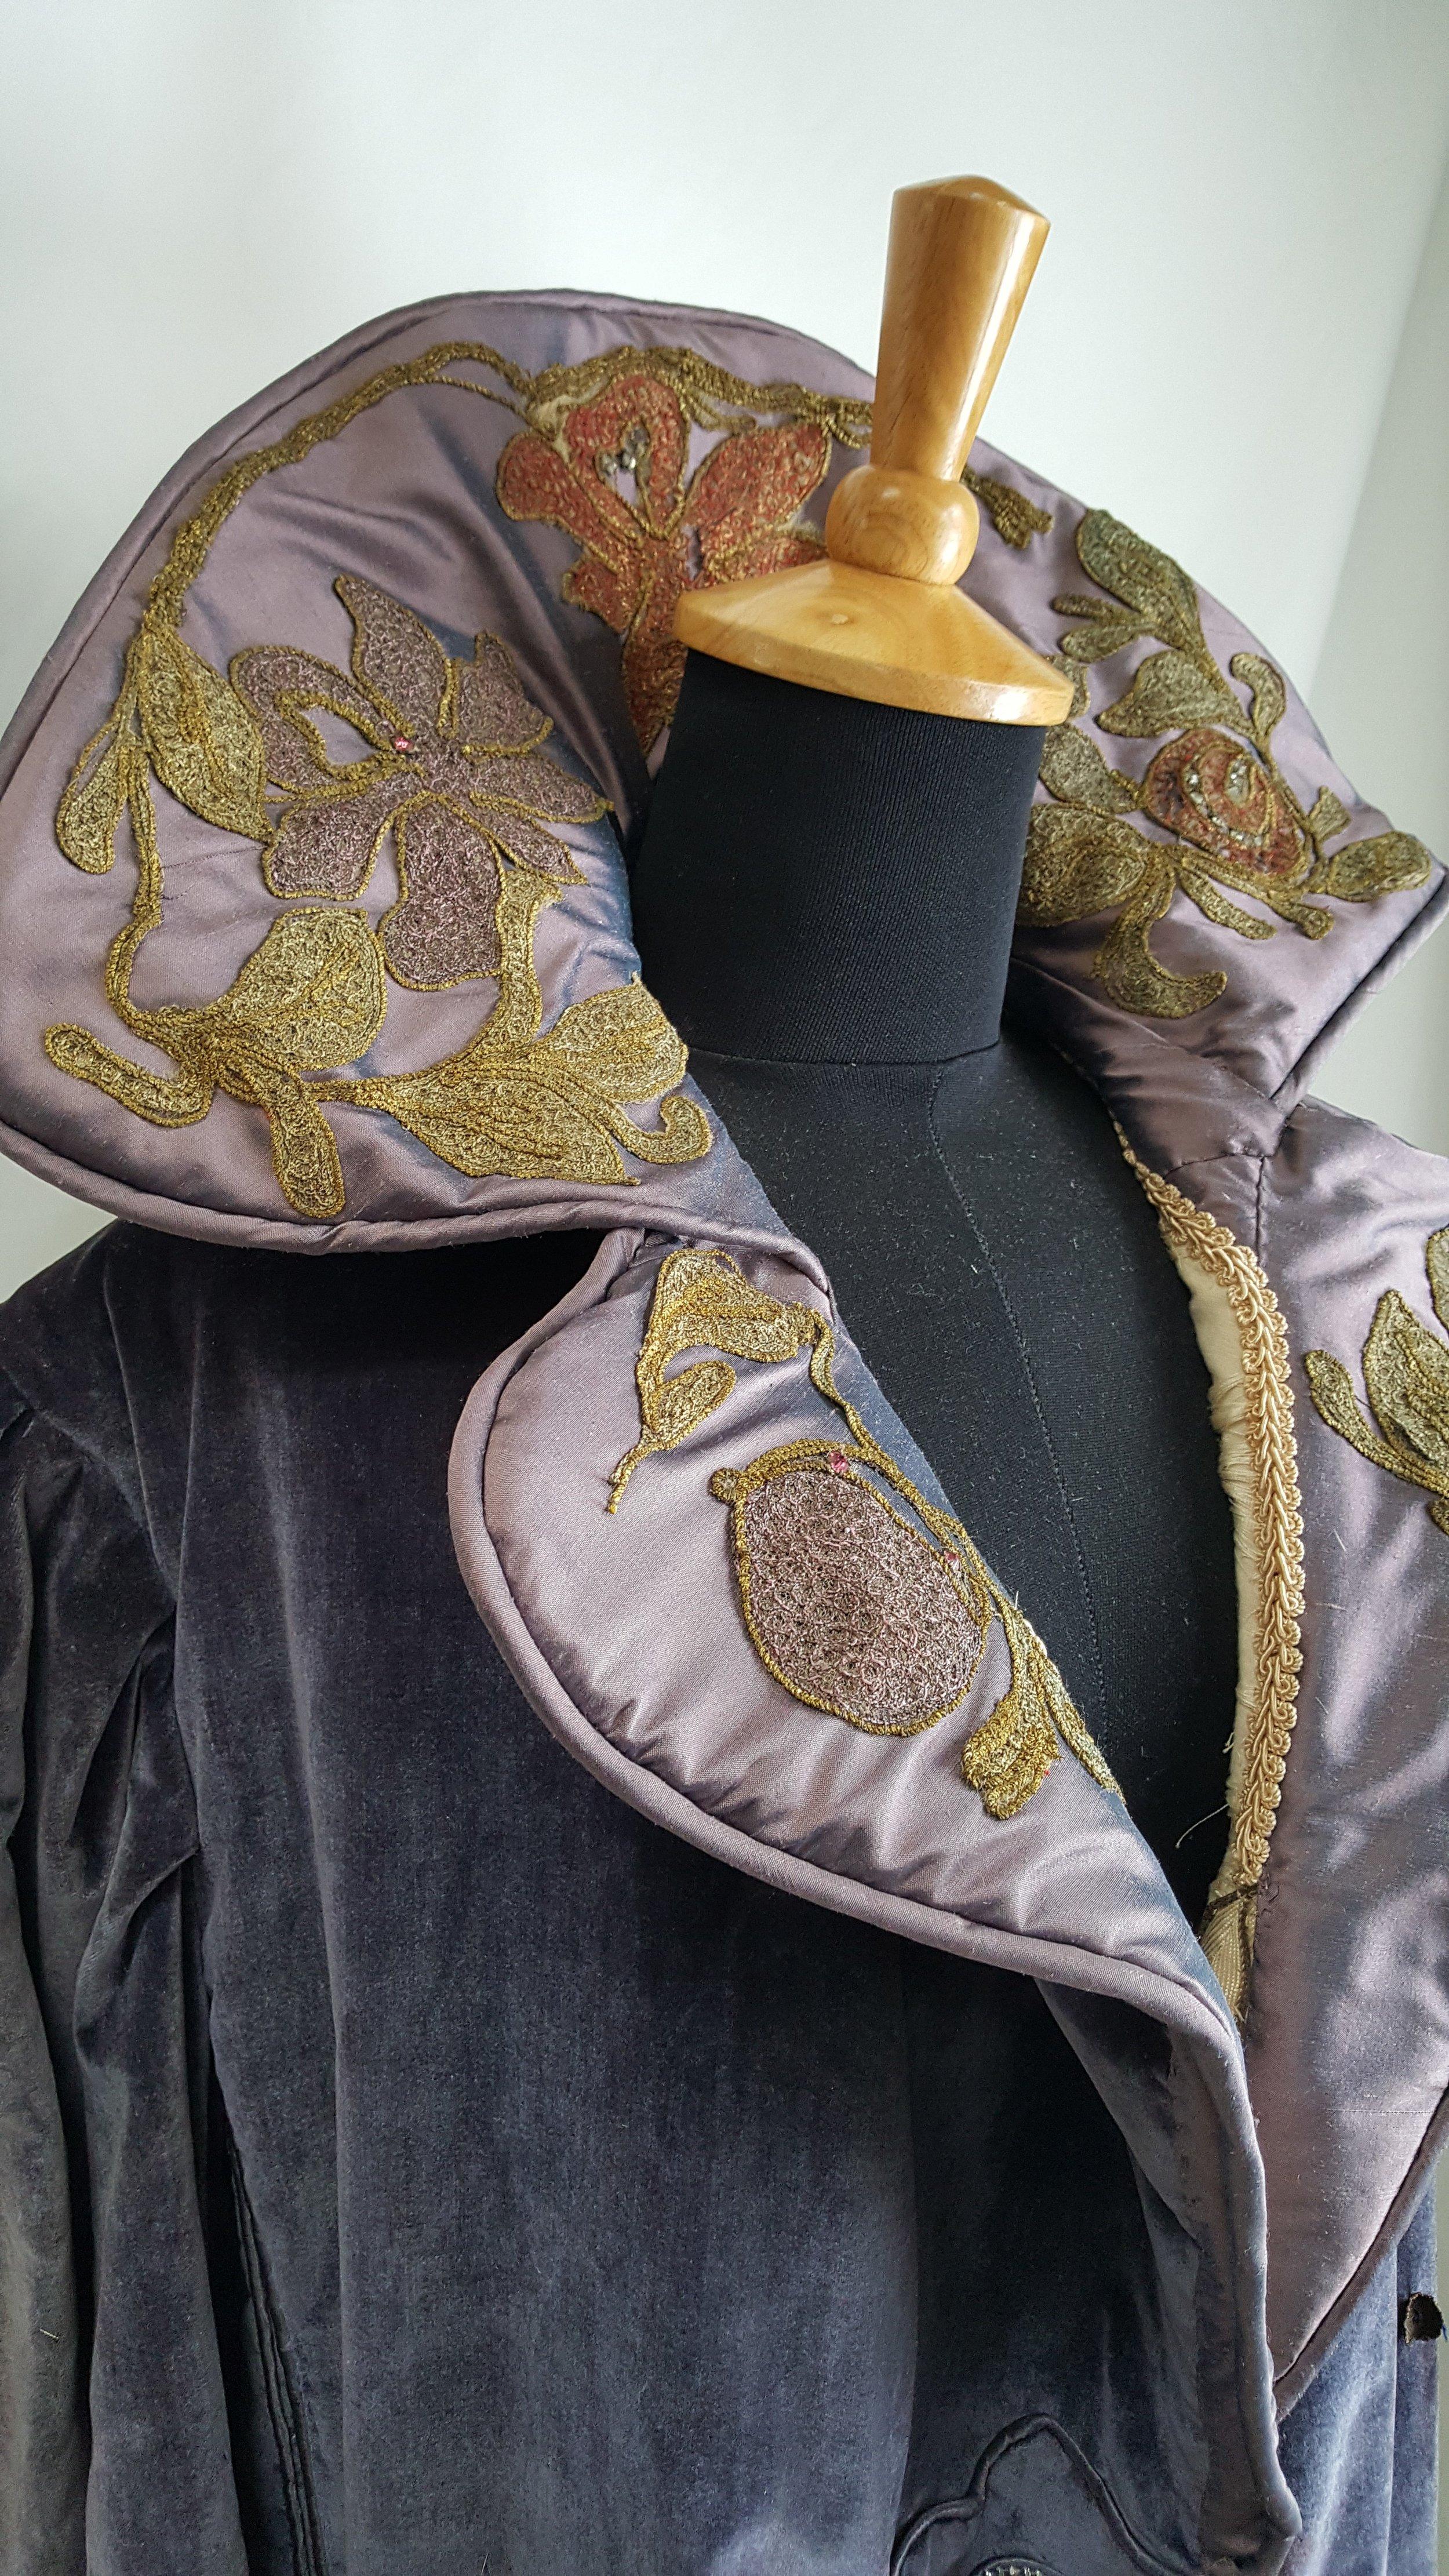 - A collar reconstruction project for Gadabout Vintage.